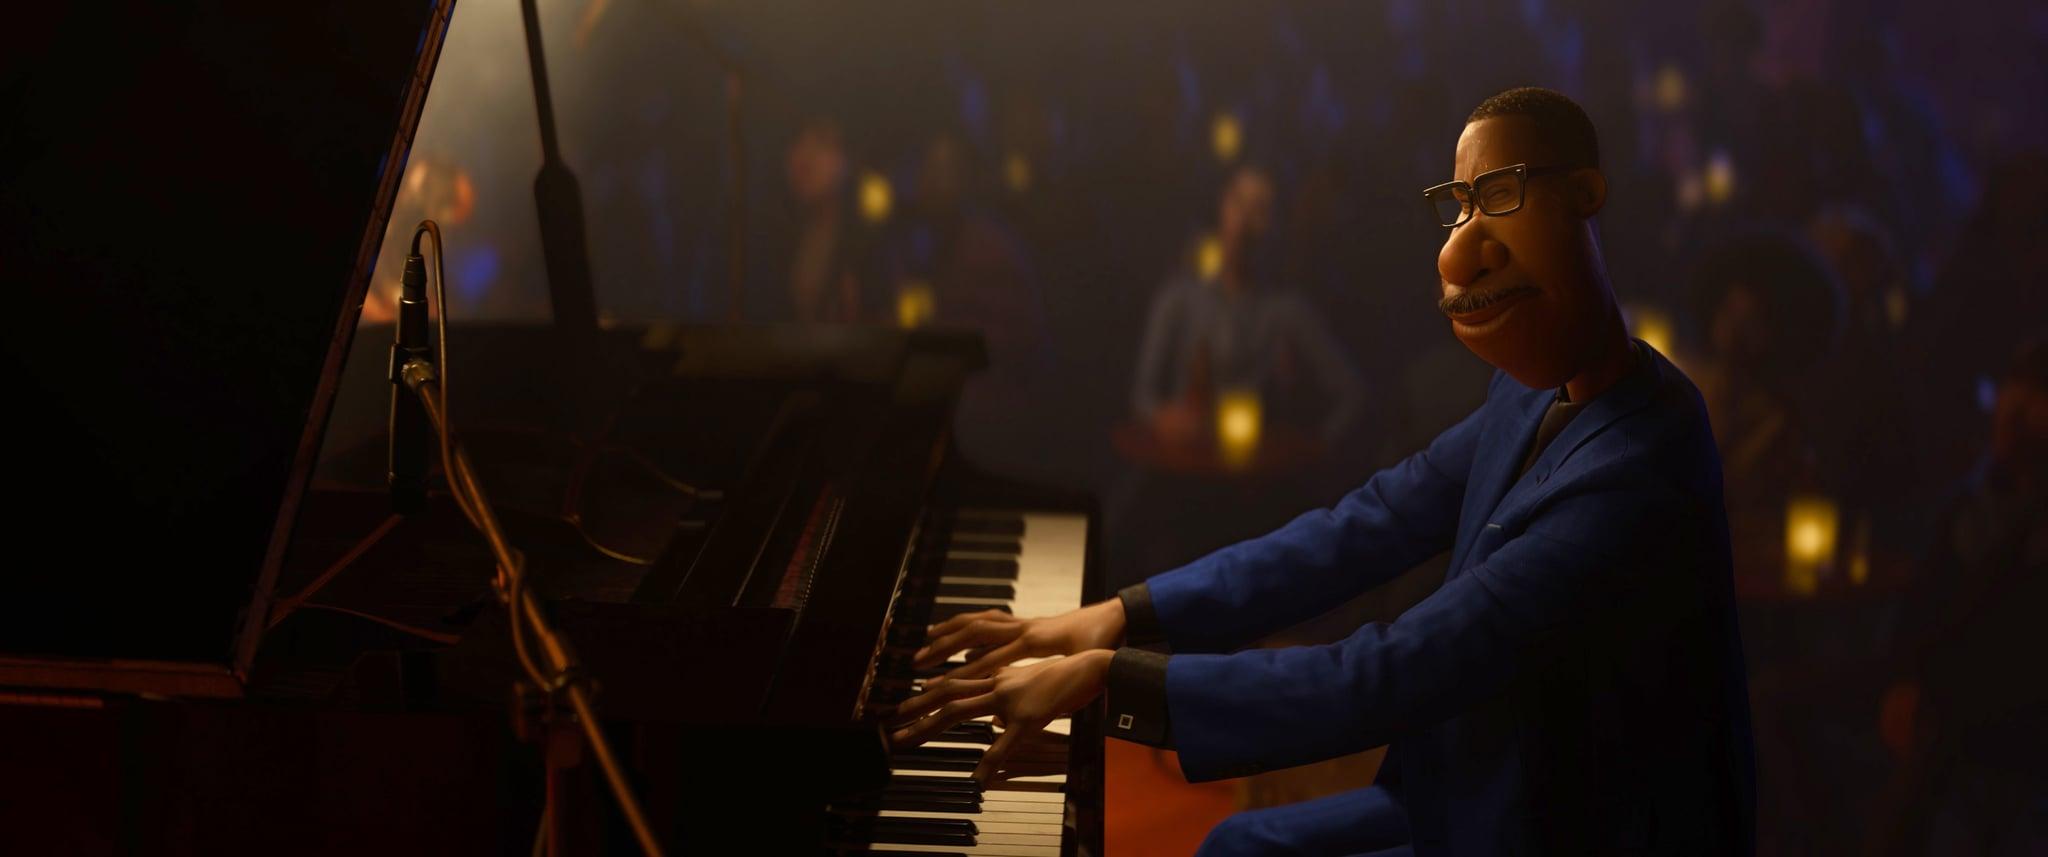 SOUL, Joe Gardner (voice: Jamie Foxx), 2020.  Walt Disney Studios Motion Pictures / Courtesy Everett Collection